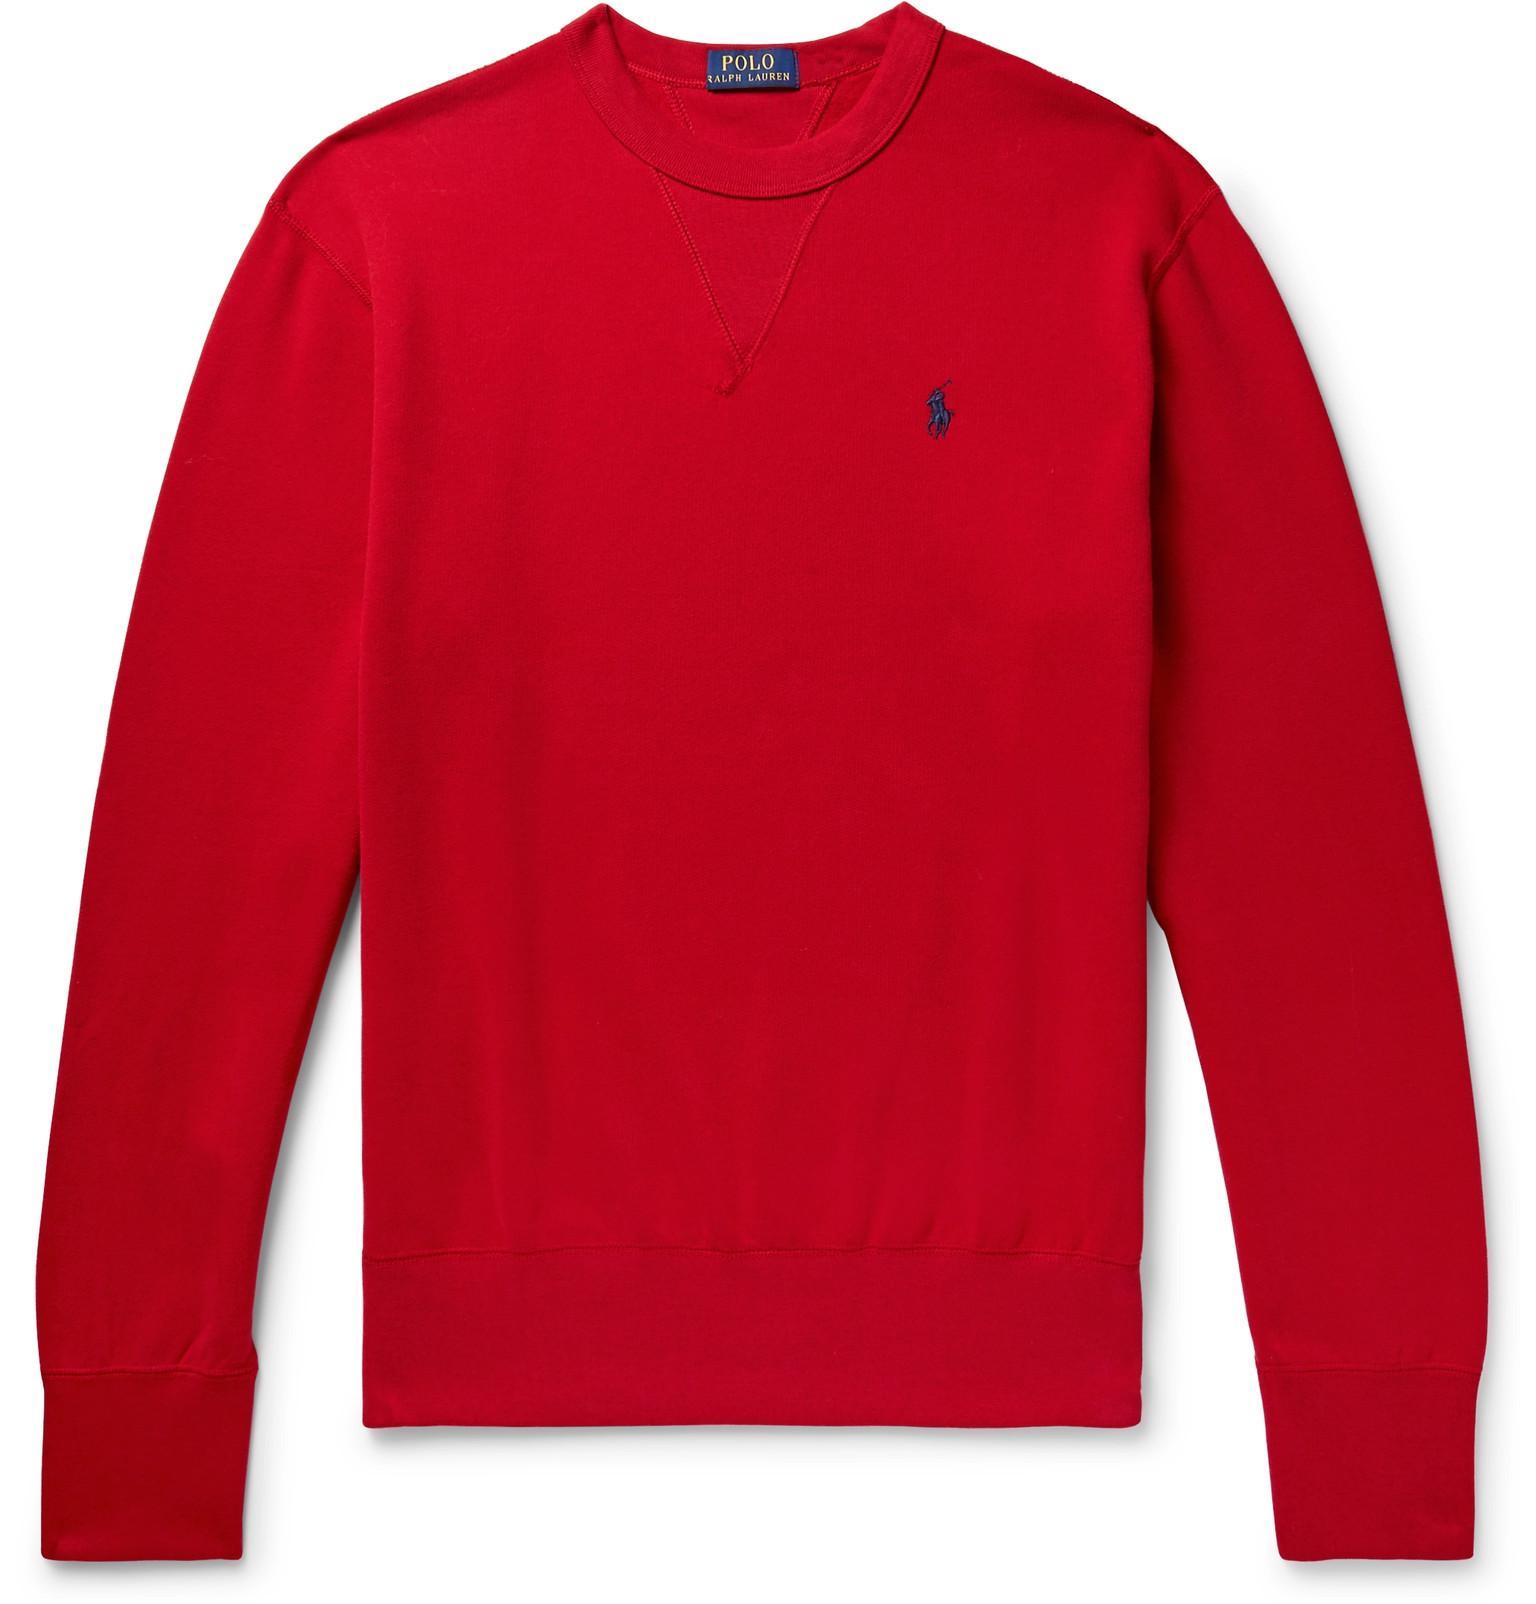 c01bd466c9a28 Polo Ralph Lauren - Red Crew Neck Sweatshirt for Men - Lyst. View fullscreen